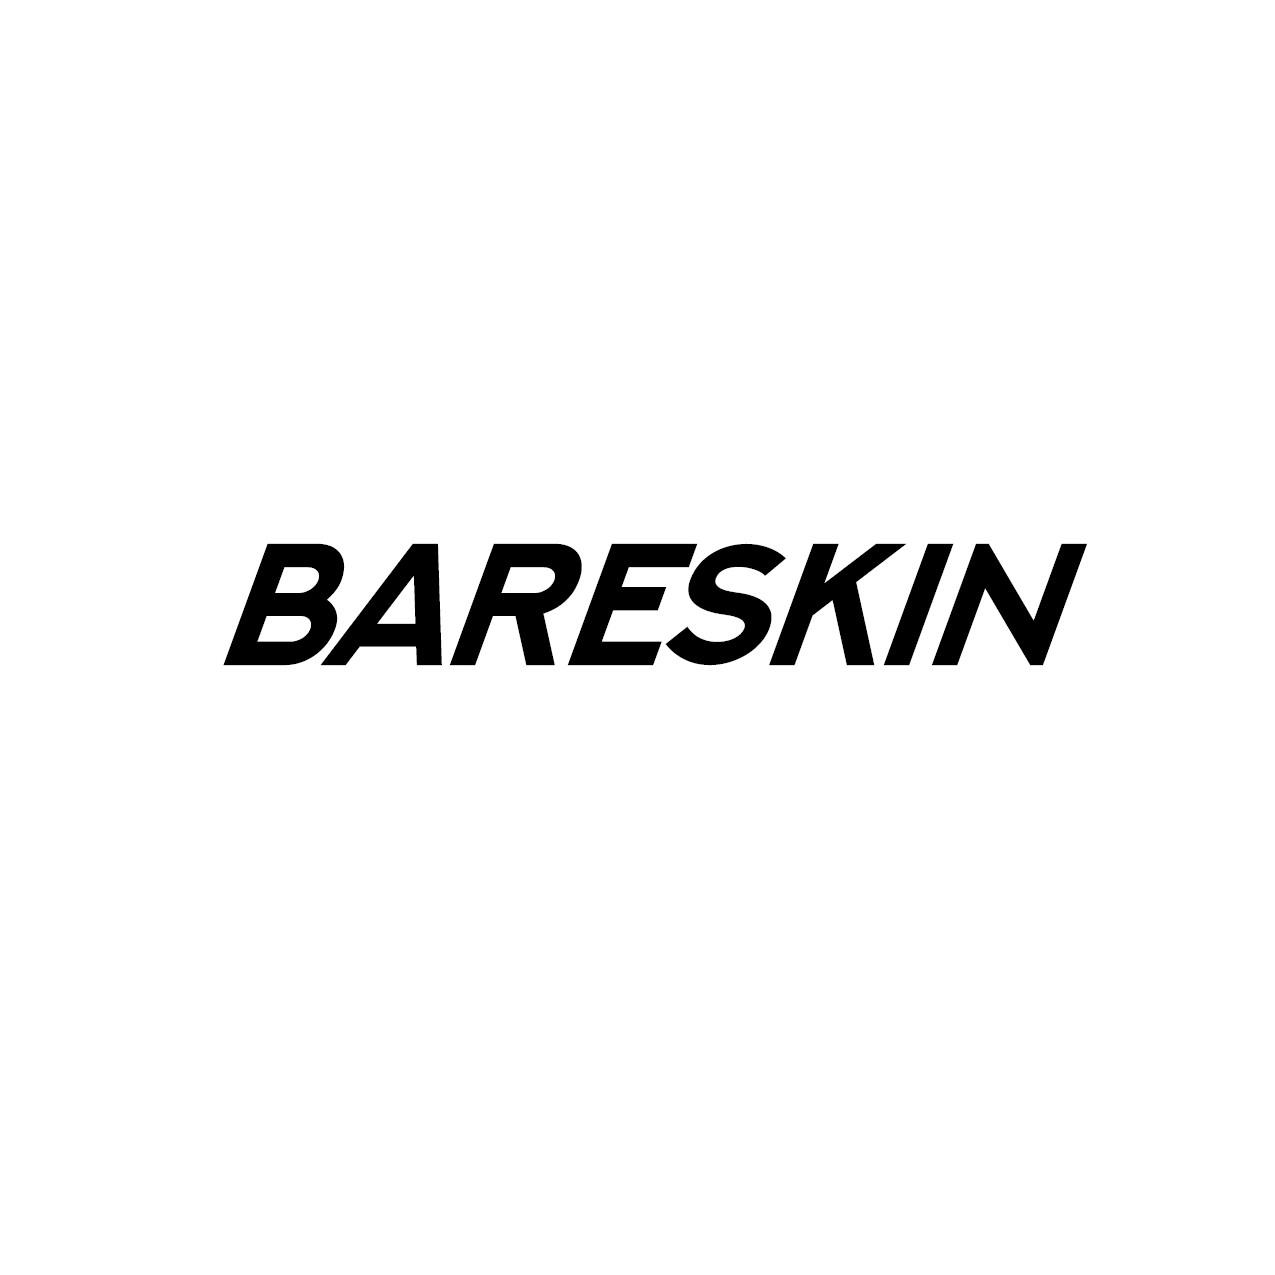 Bareskin Logo